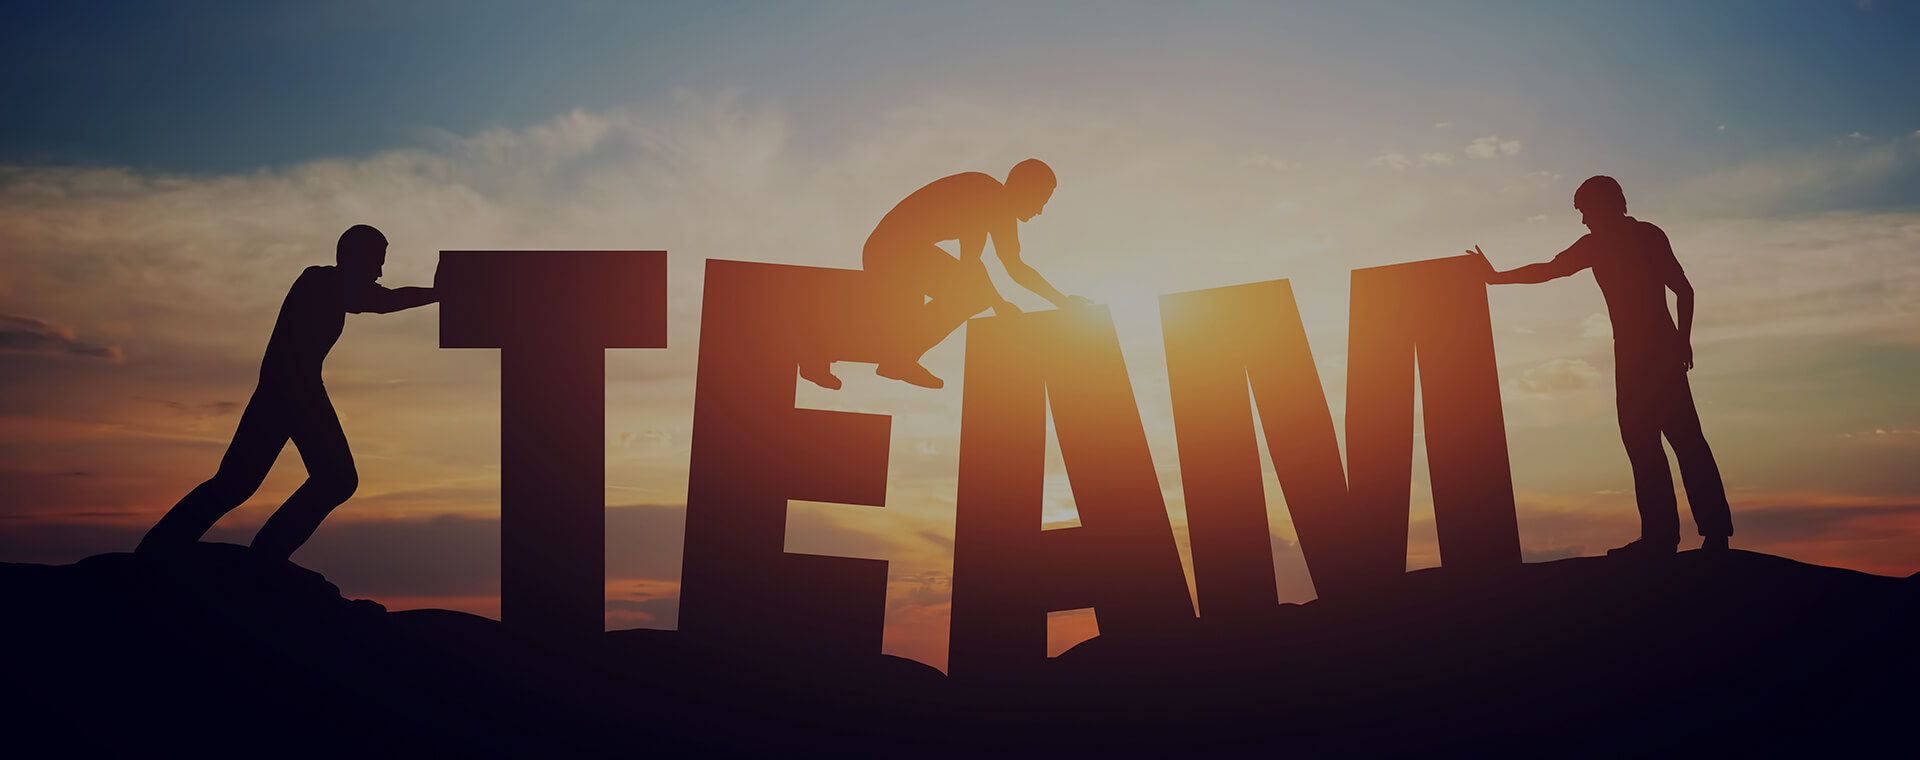 Teamolympiade Teambuilding